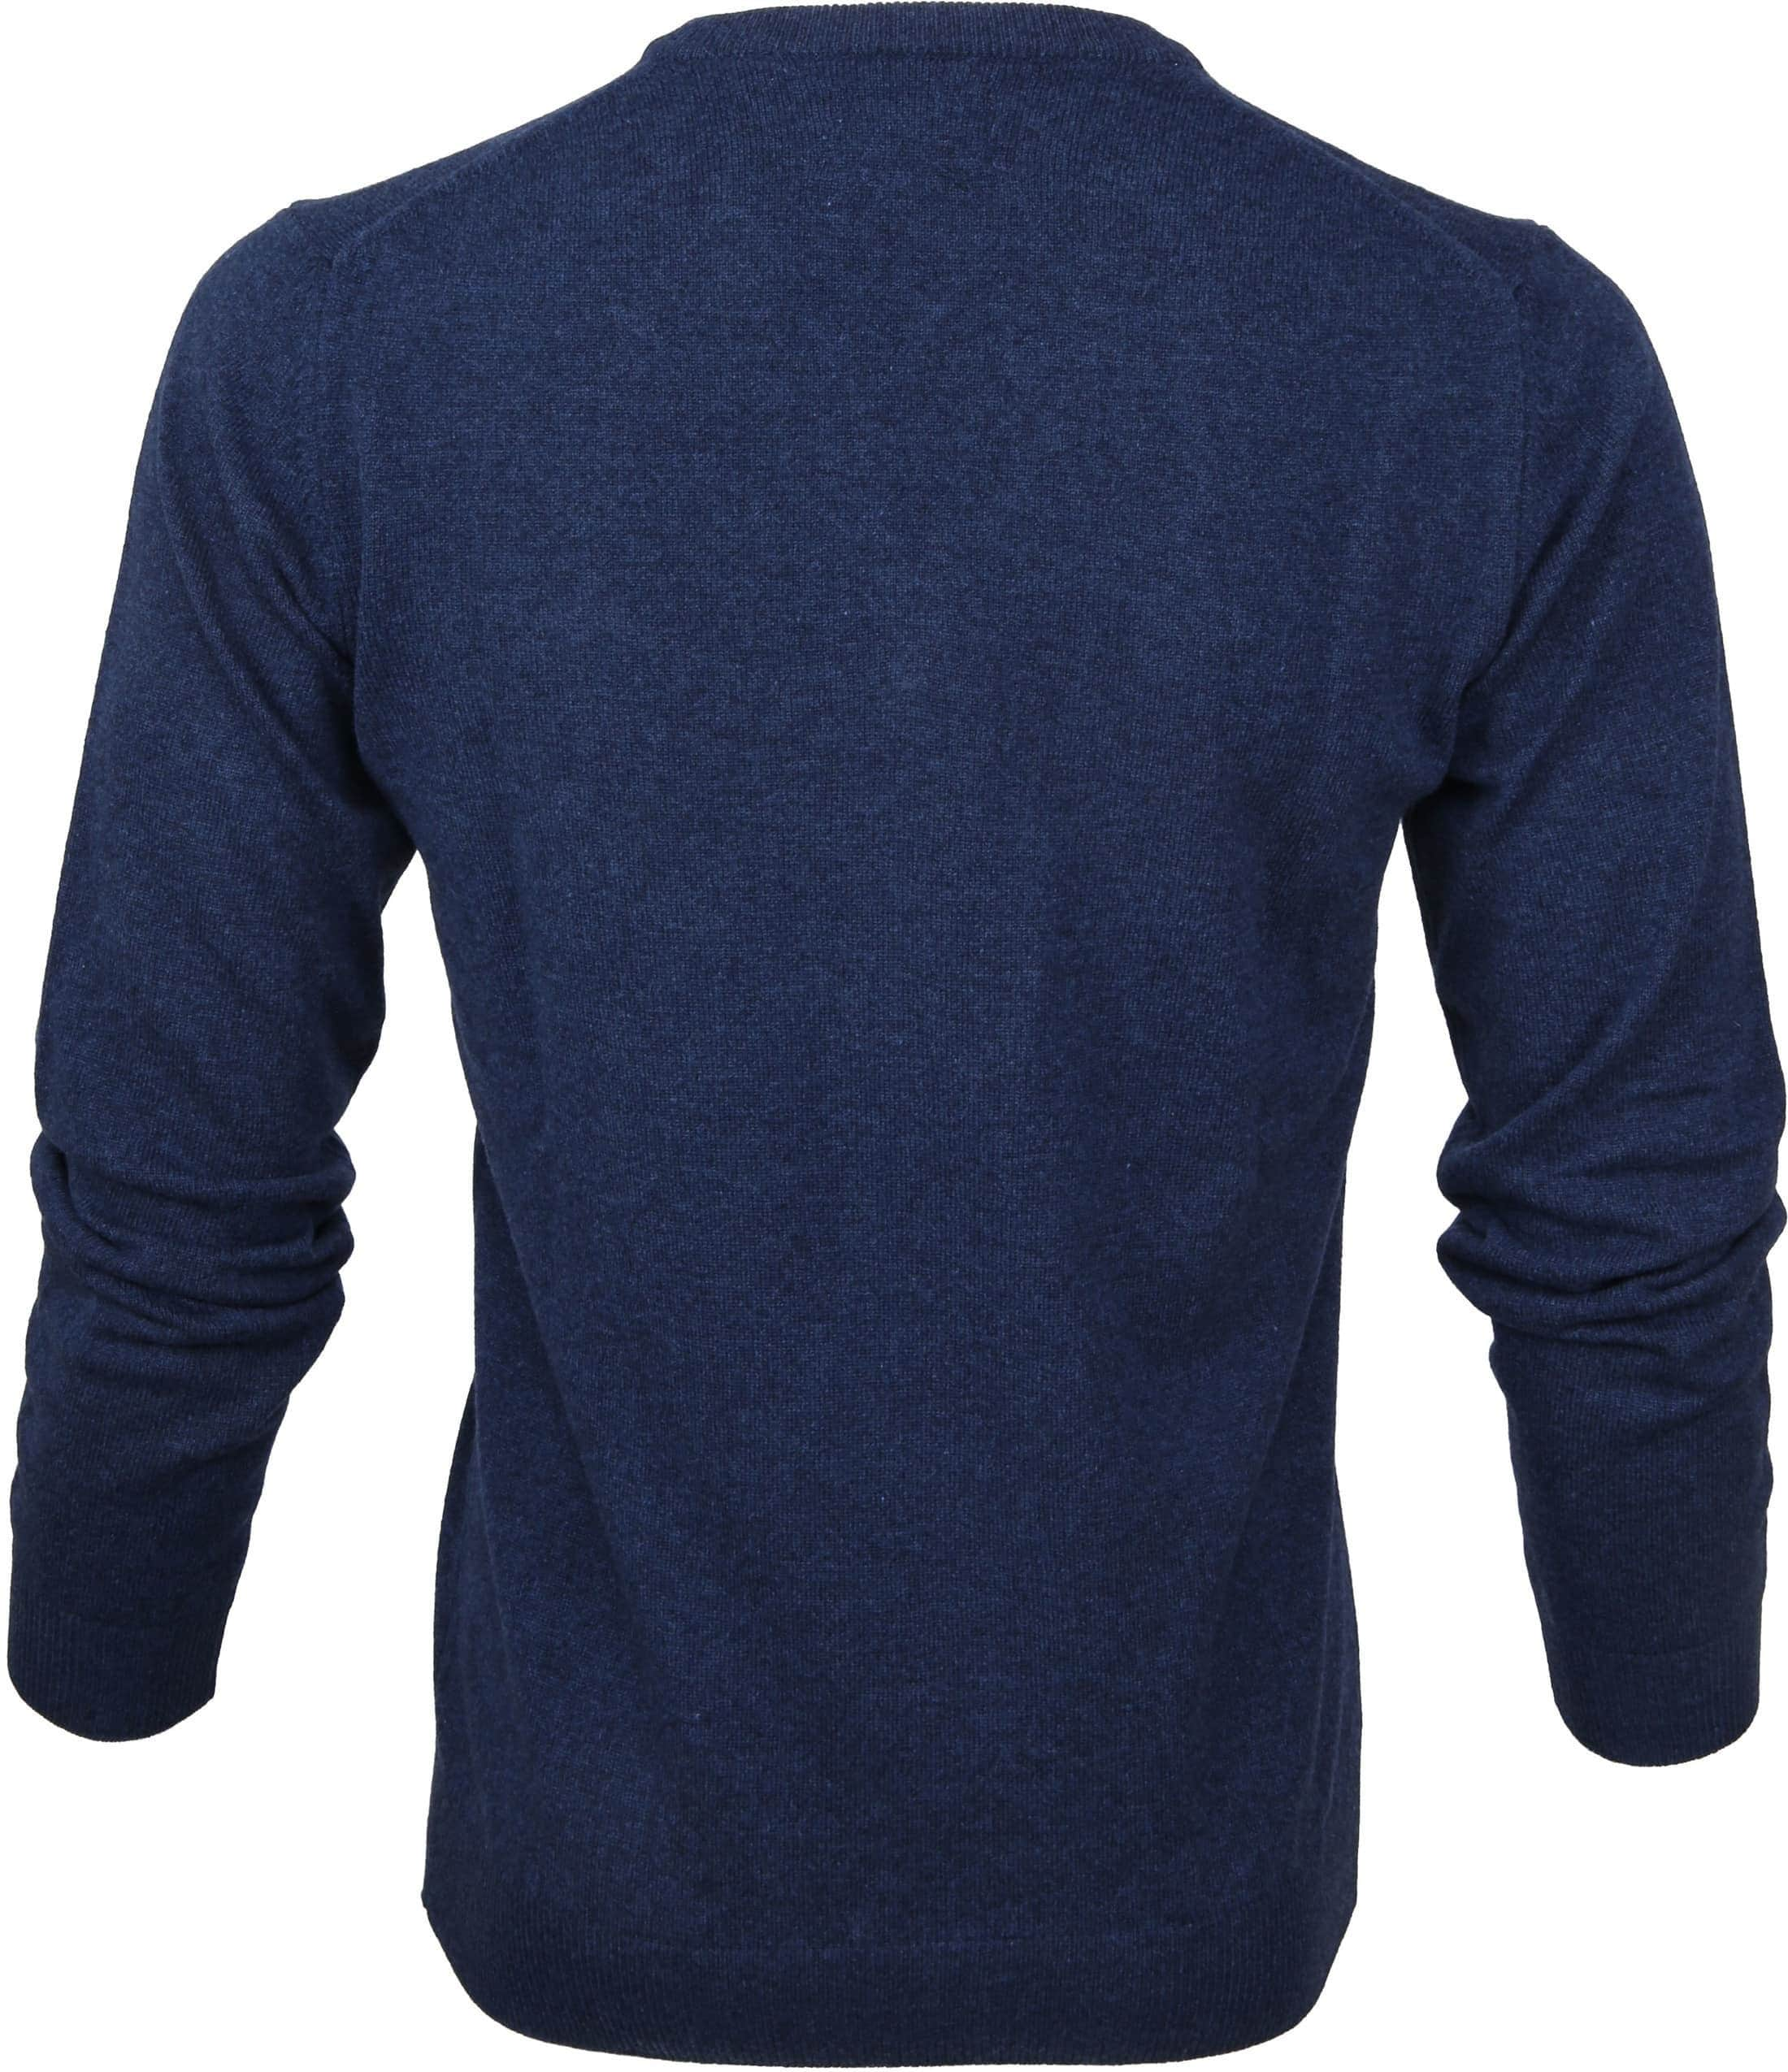 Gant Pullover Lamswol Blauw foto 2